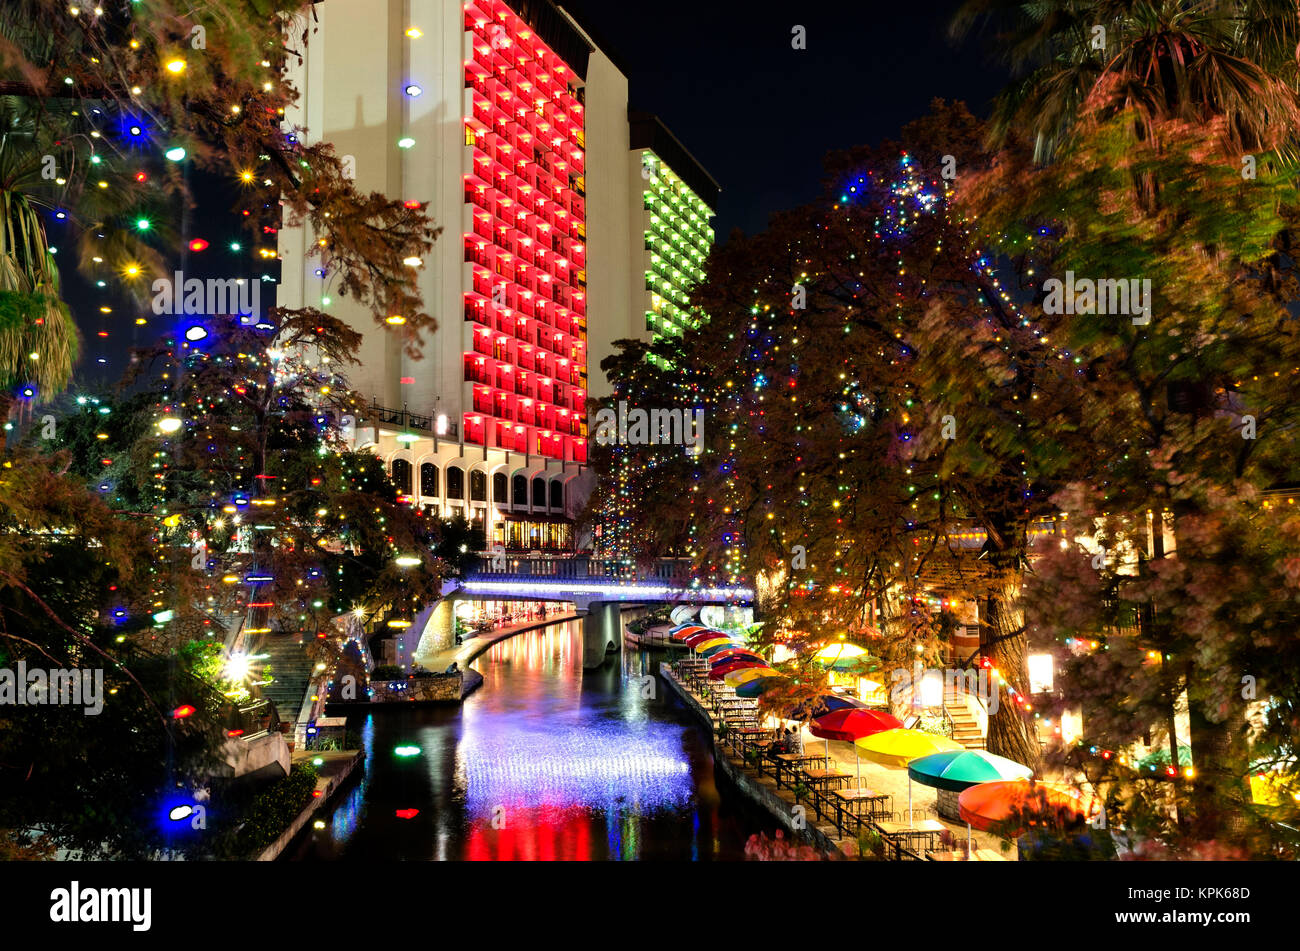 Riverwalk San Antonio Christmas.Riverwalk San Antonio Christmas Stock Photos Riverwalk San